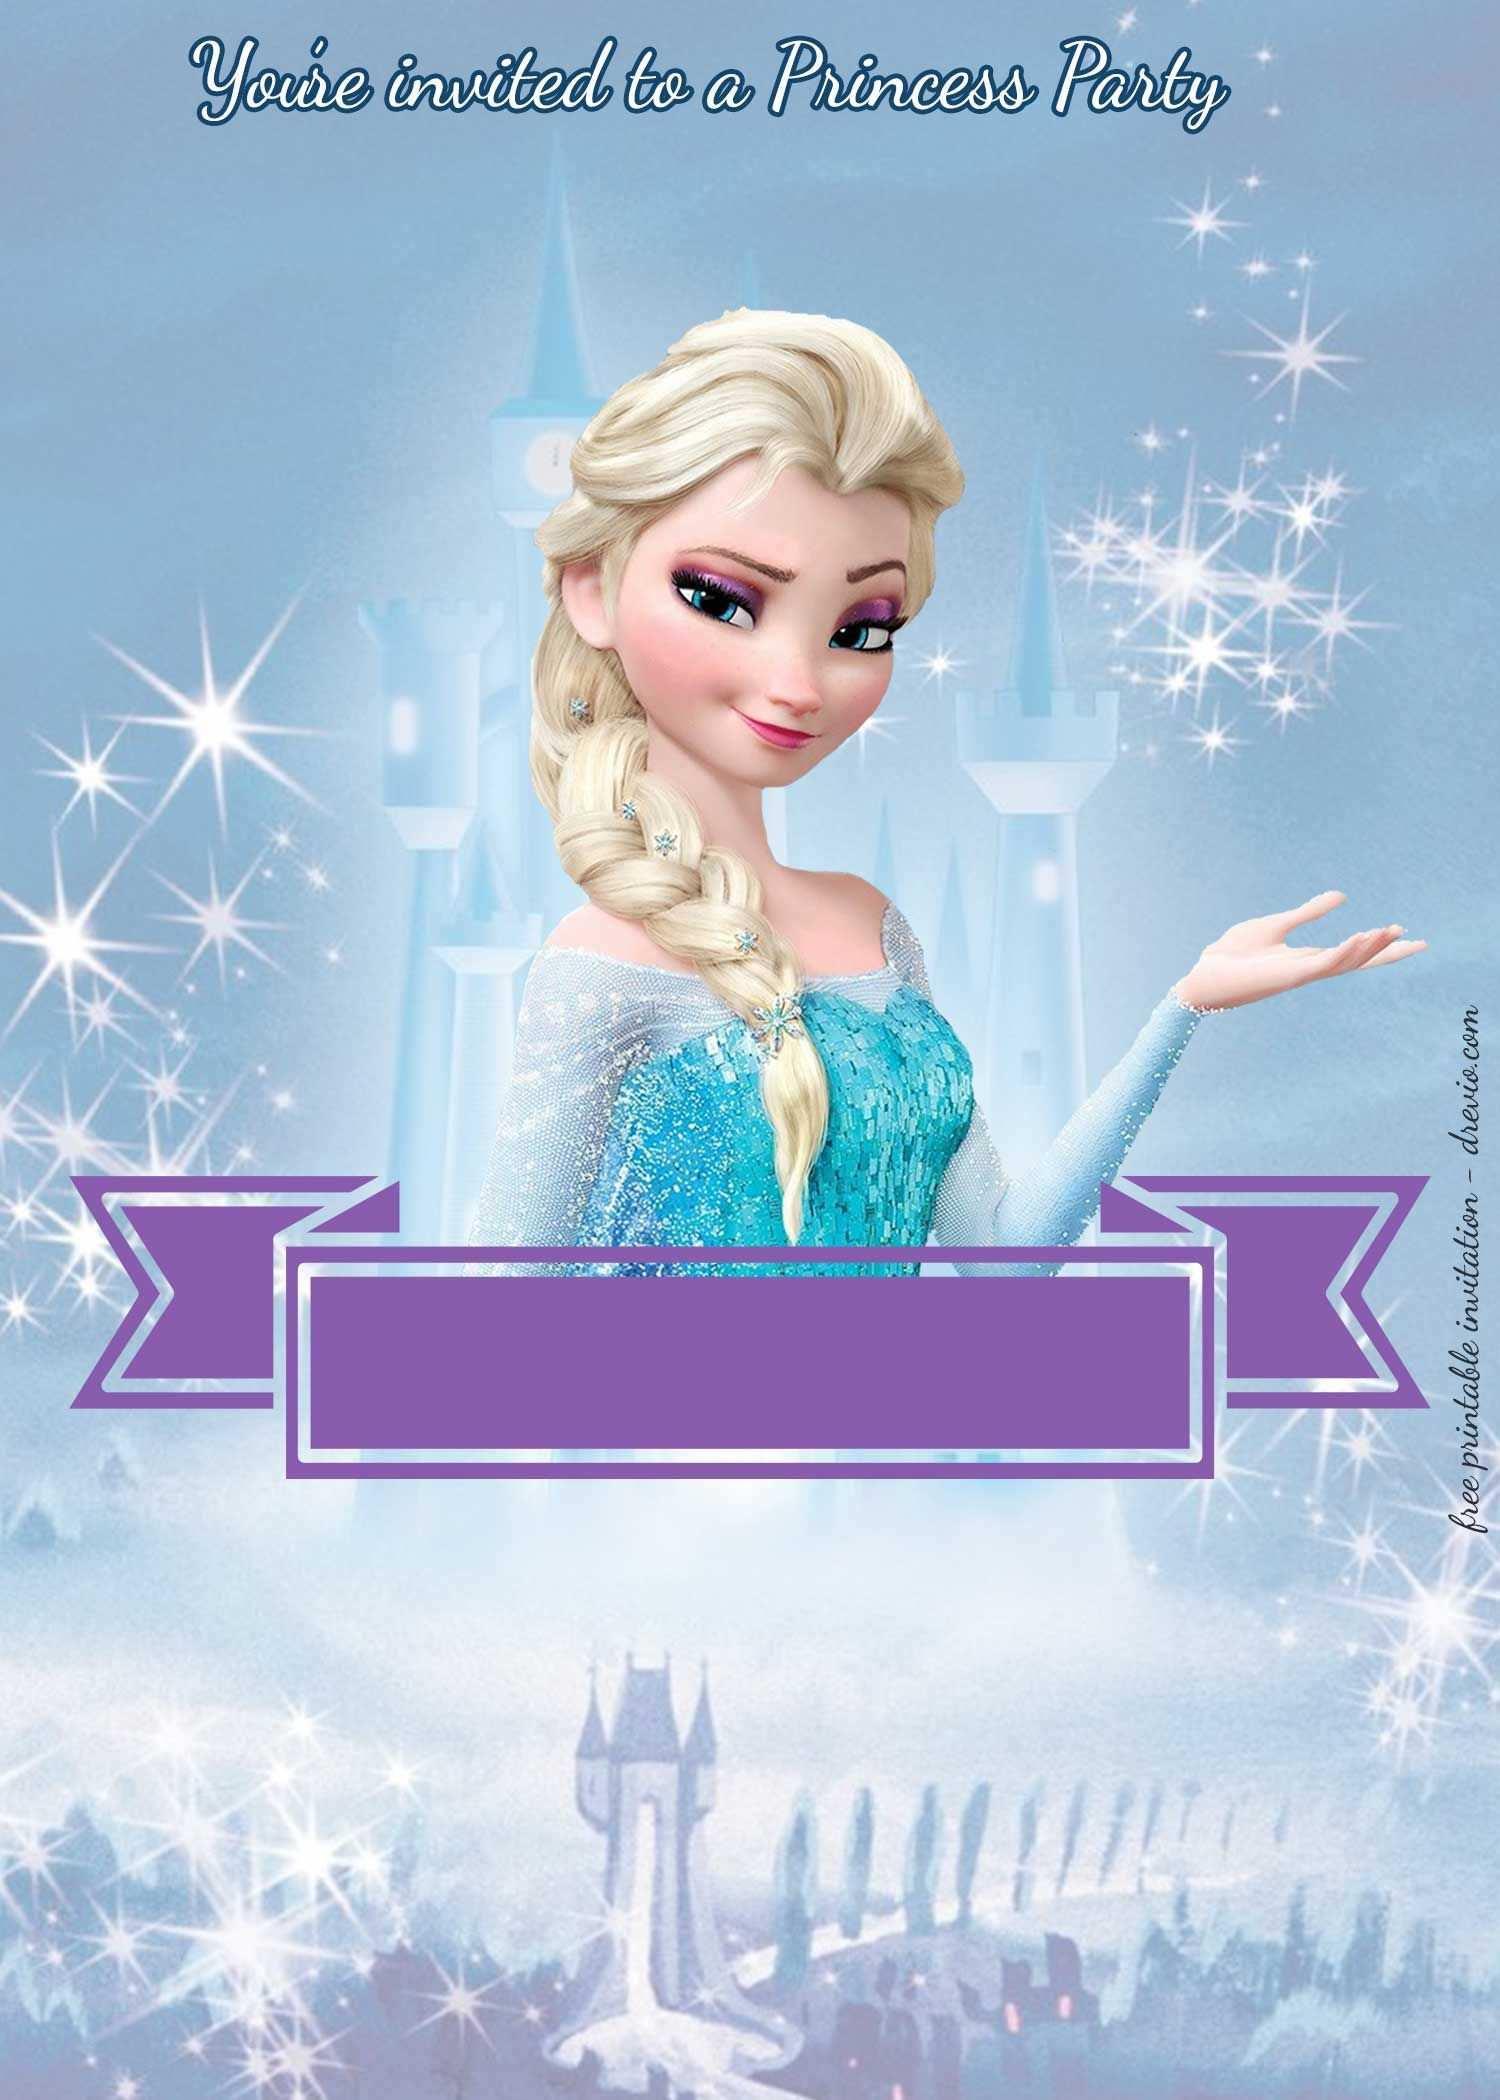 Frozen Invitations Template Free from legaldbol.com